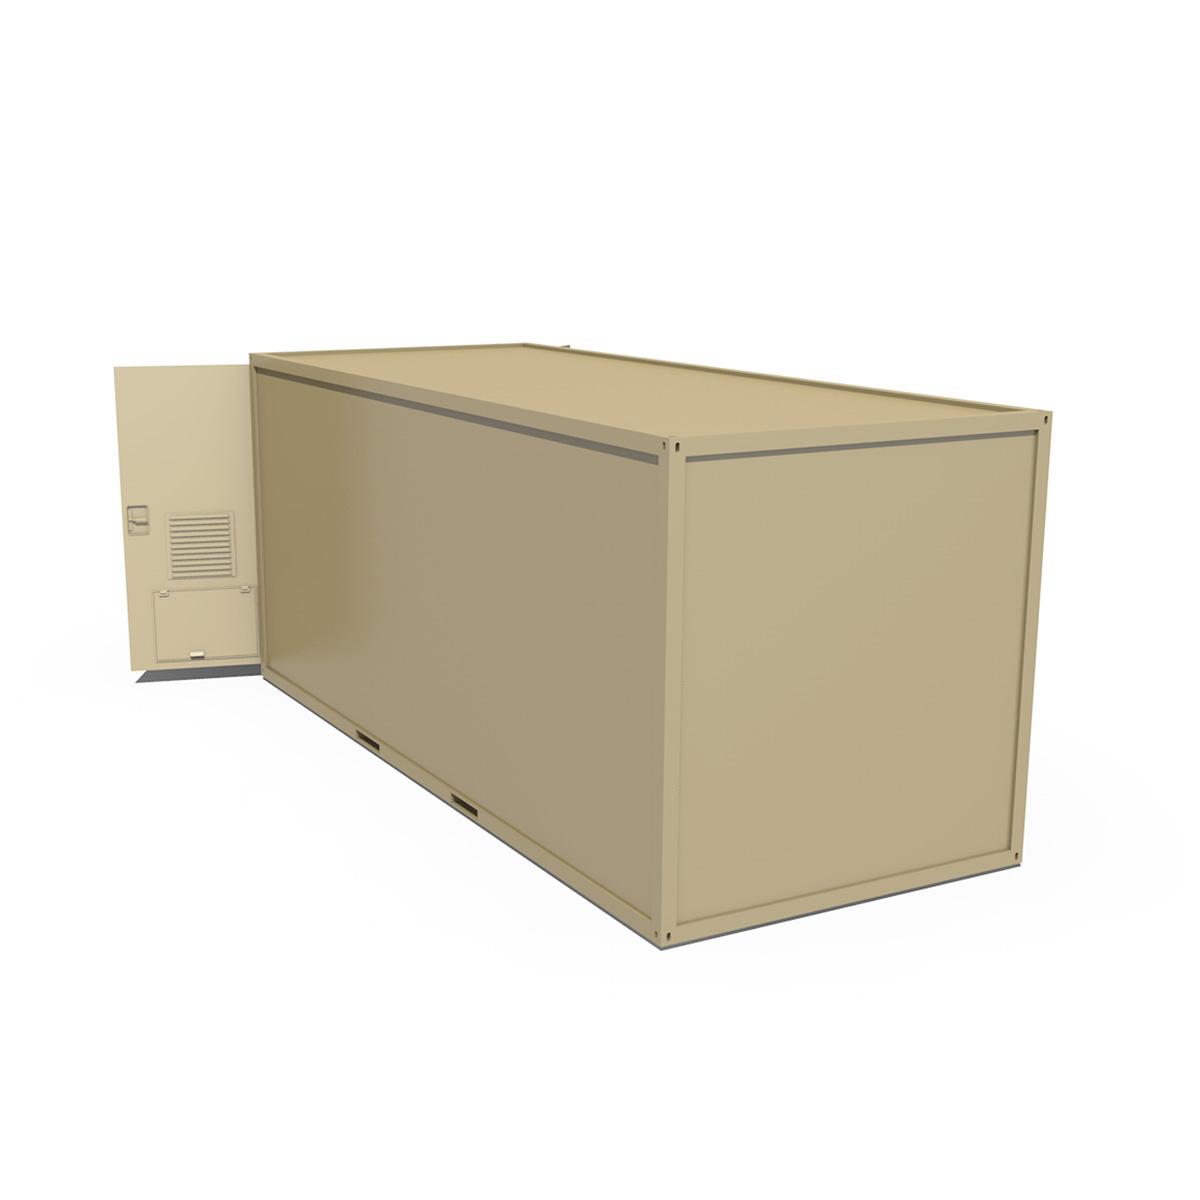 20ft office container version three 3d model 3ds fbx c4d lwo obj 252286